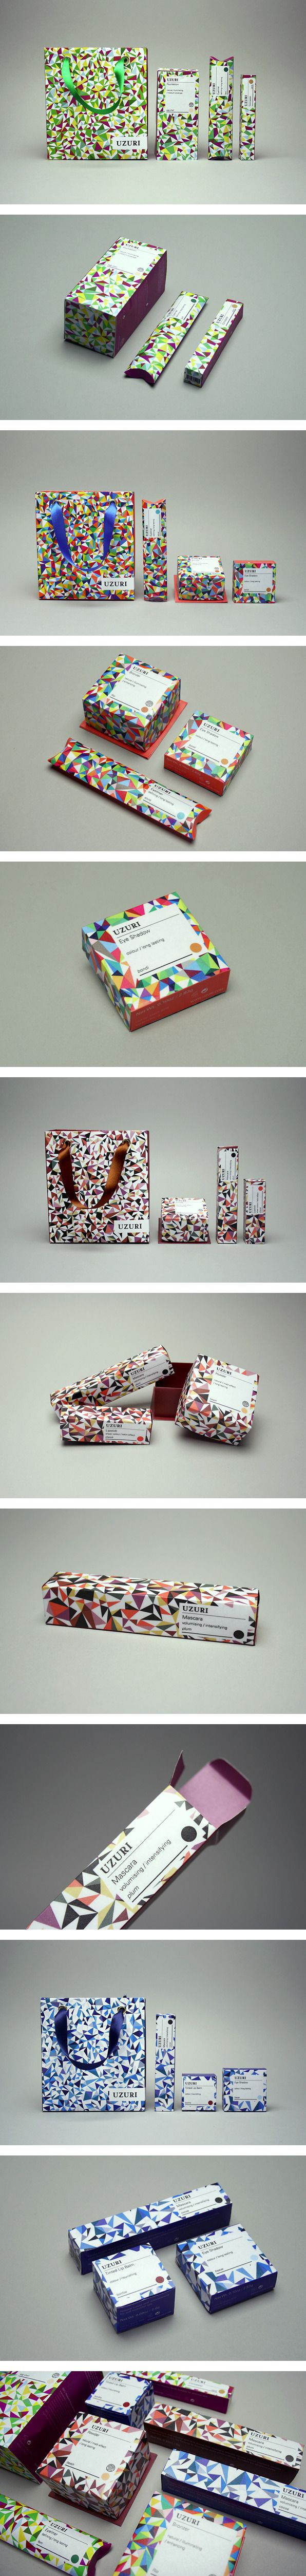 Uzuri – Seasonal Makeup Collections by Chloe Galea